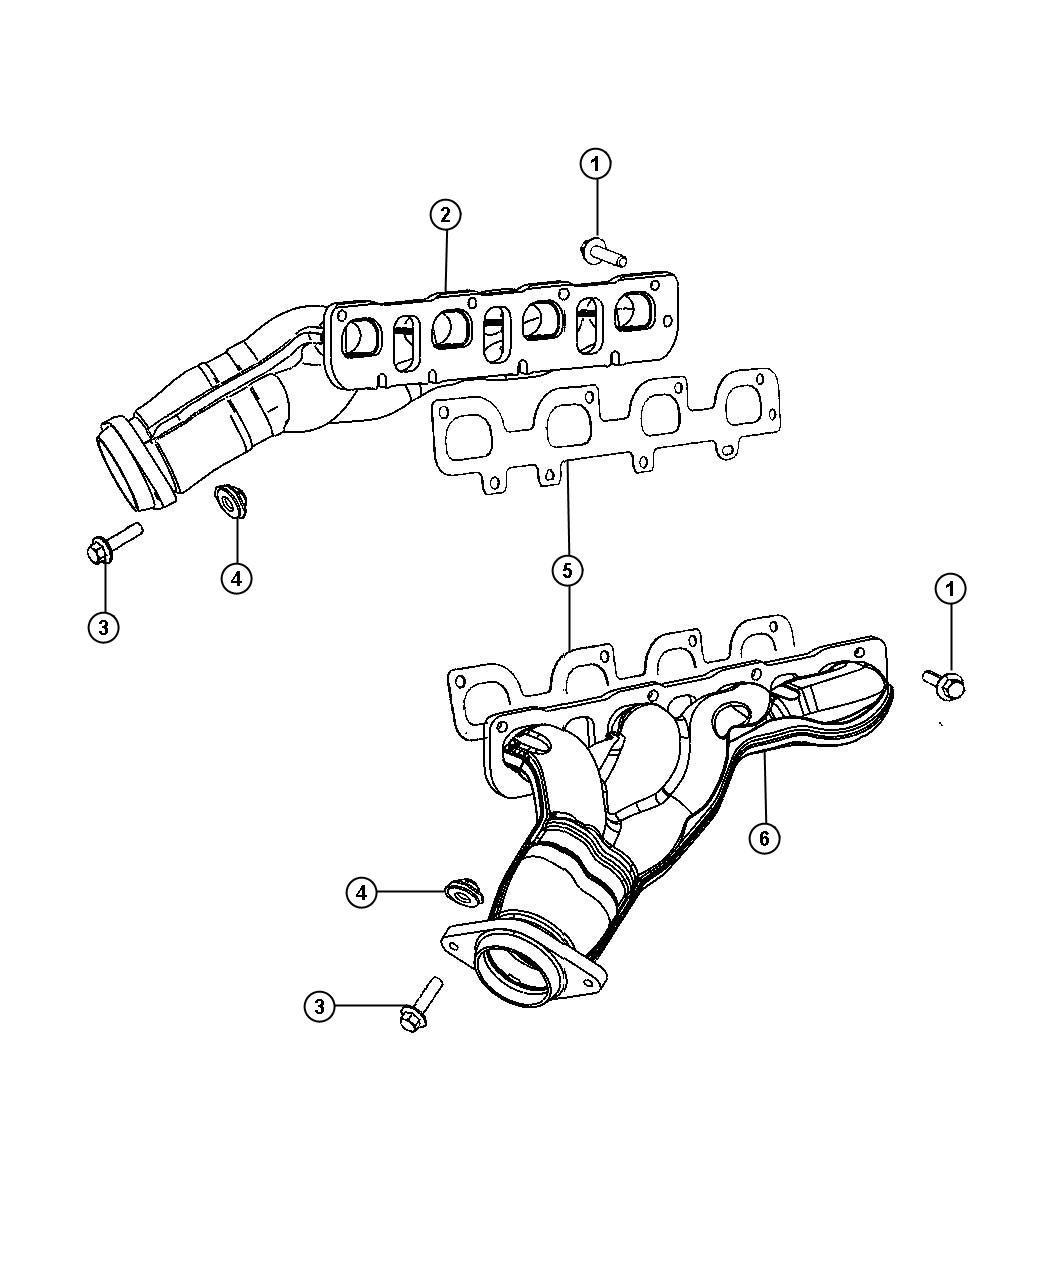 Jeep Grand Cherokee Manifold Exhaust Left Engine